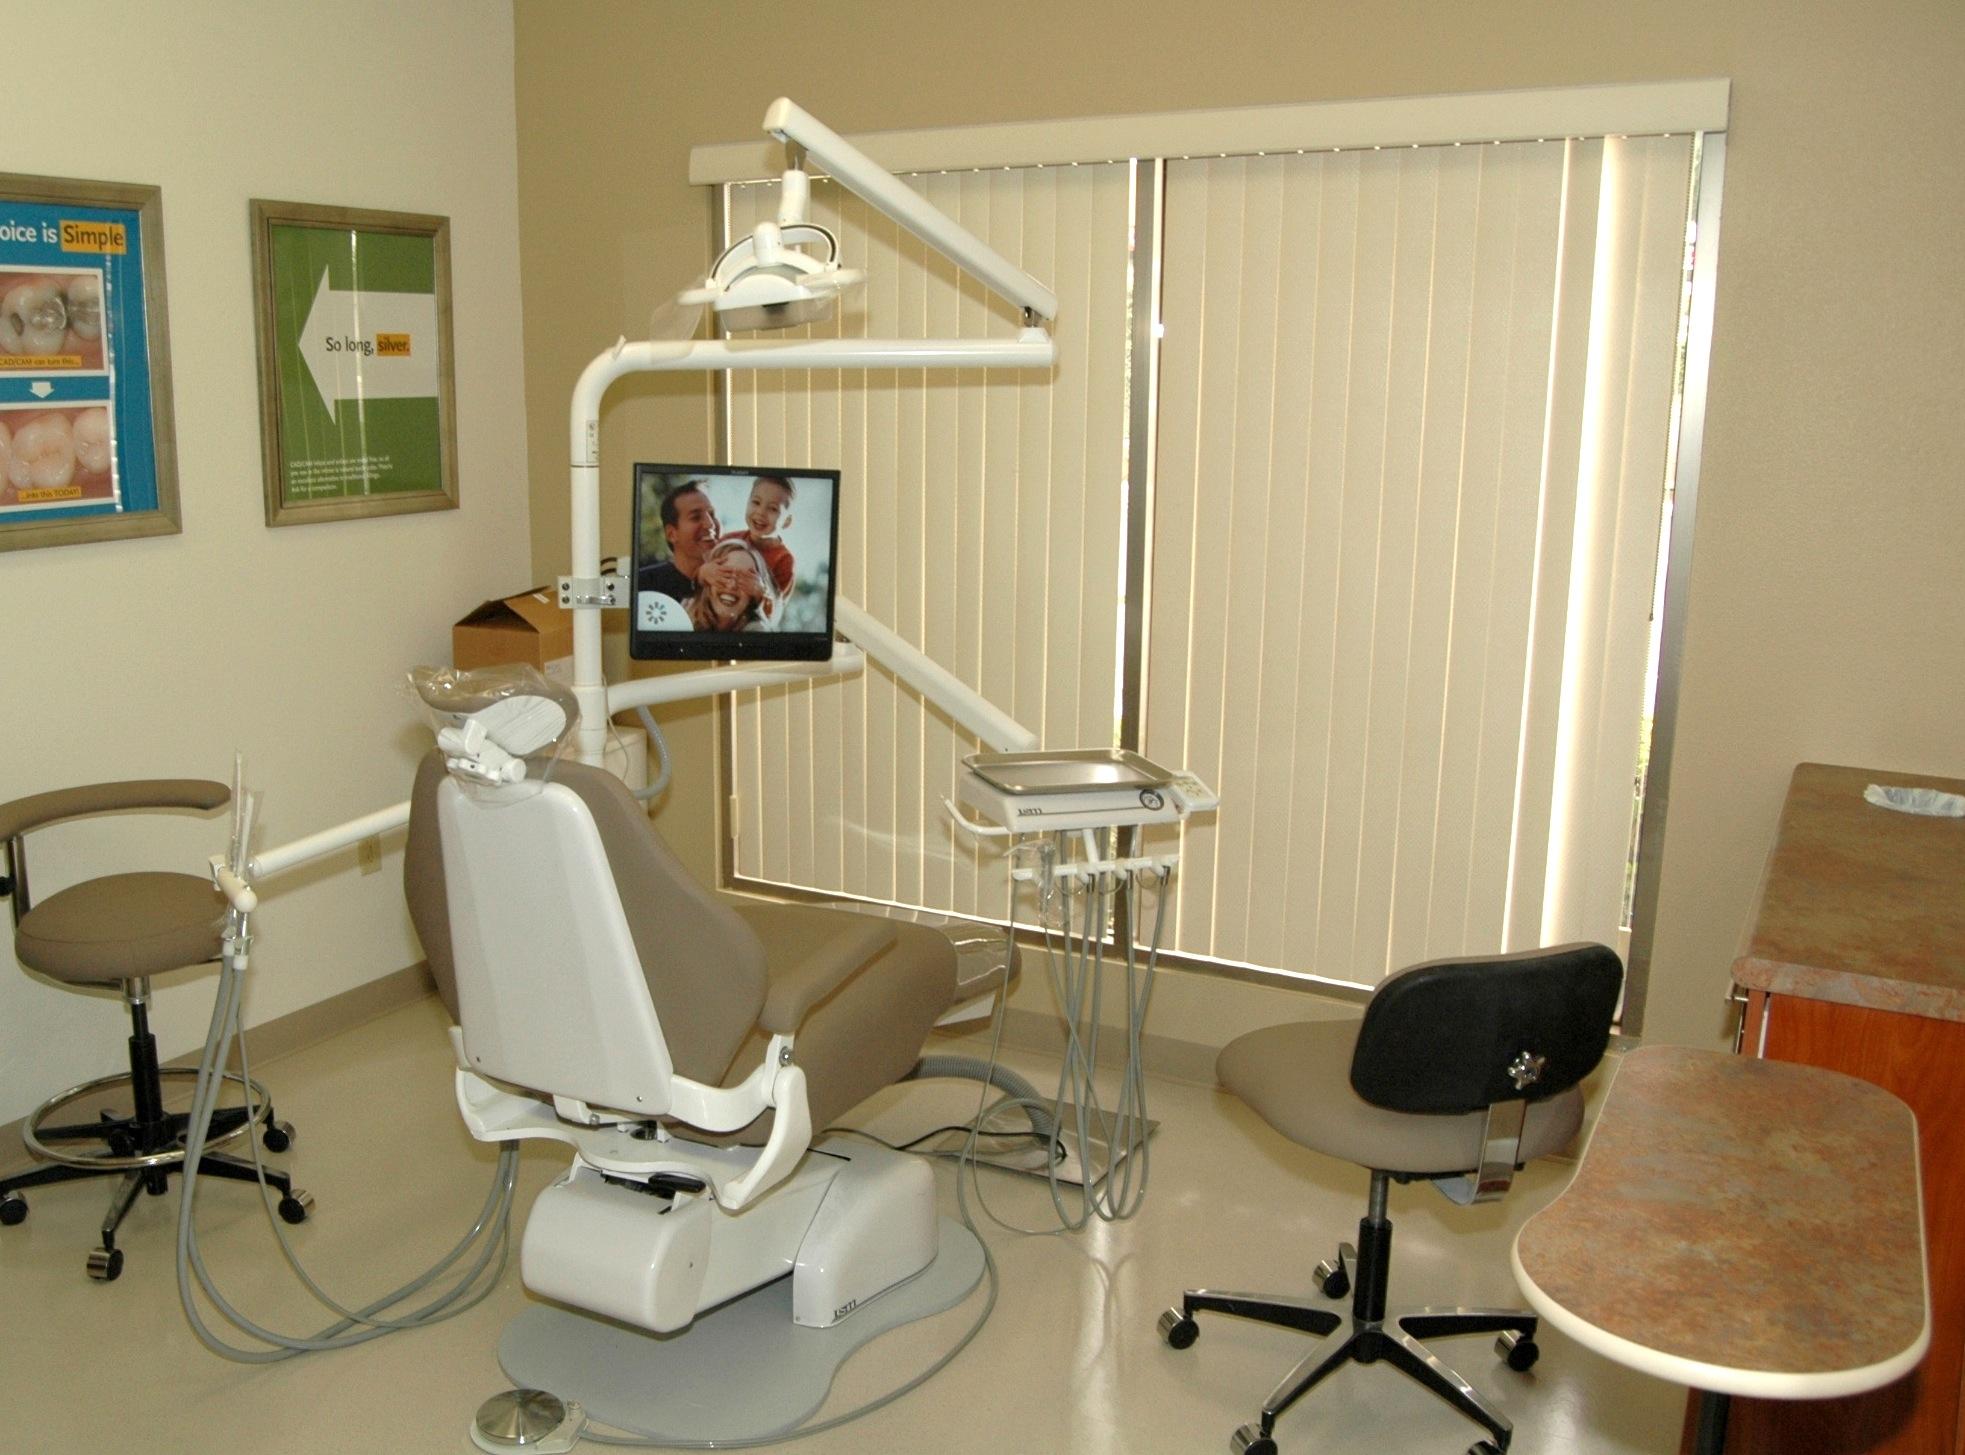 Yorba Linda Smiles Dentistry and Orthodontics image 4